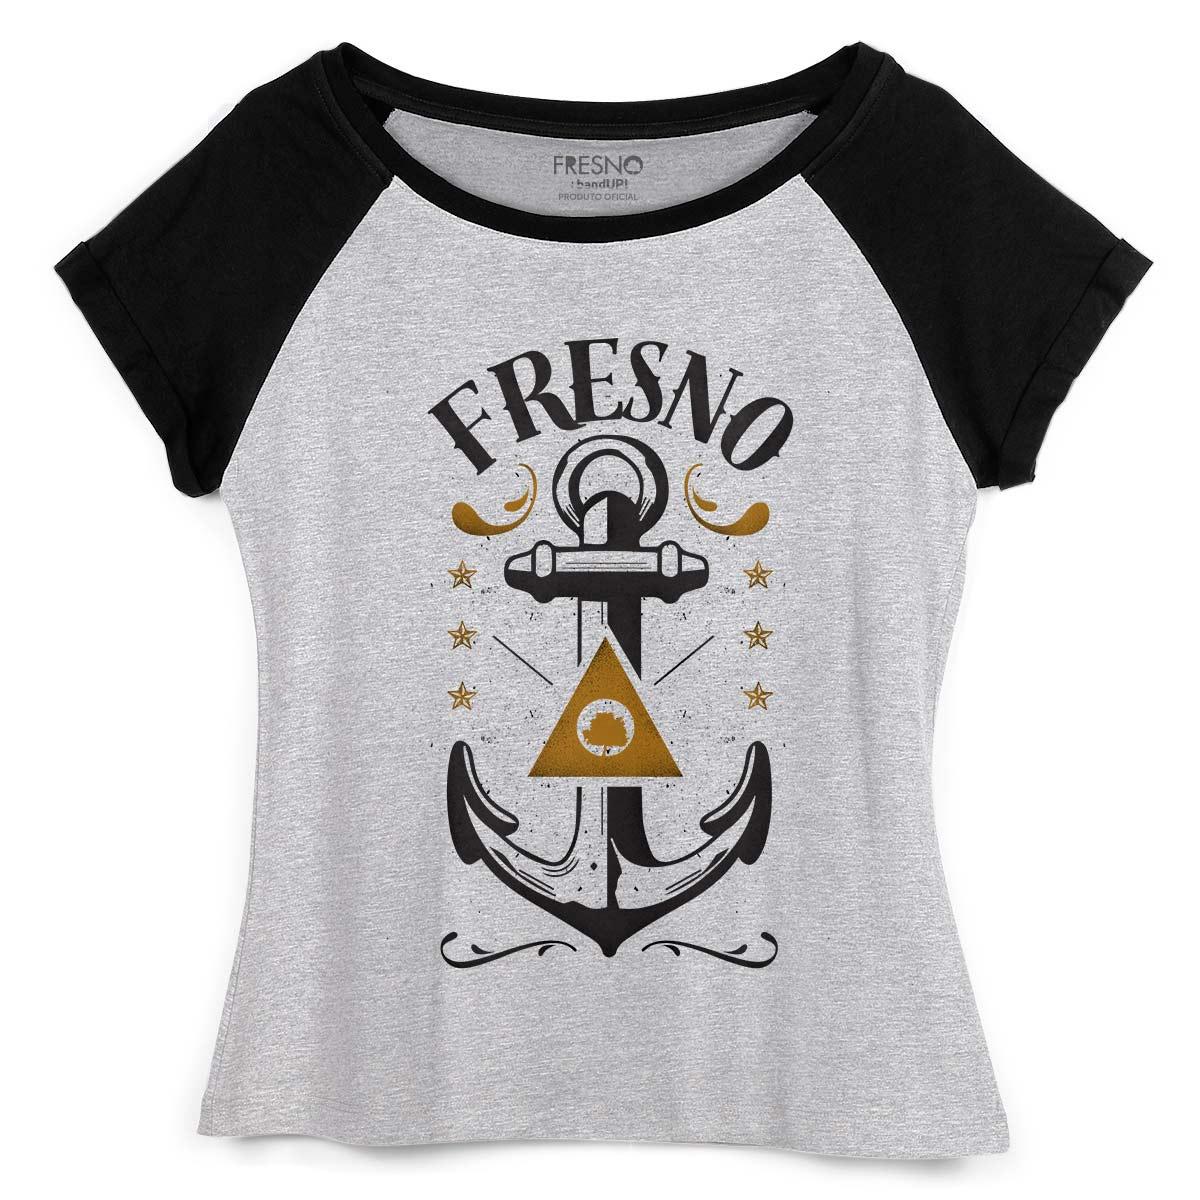 Camiseta Raglan Feminina Fresno Nautic